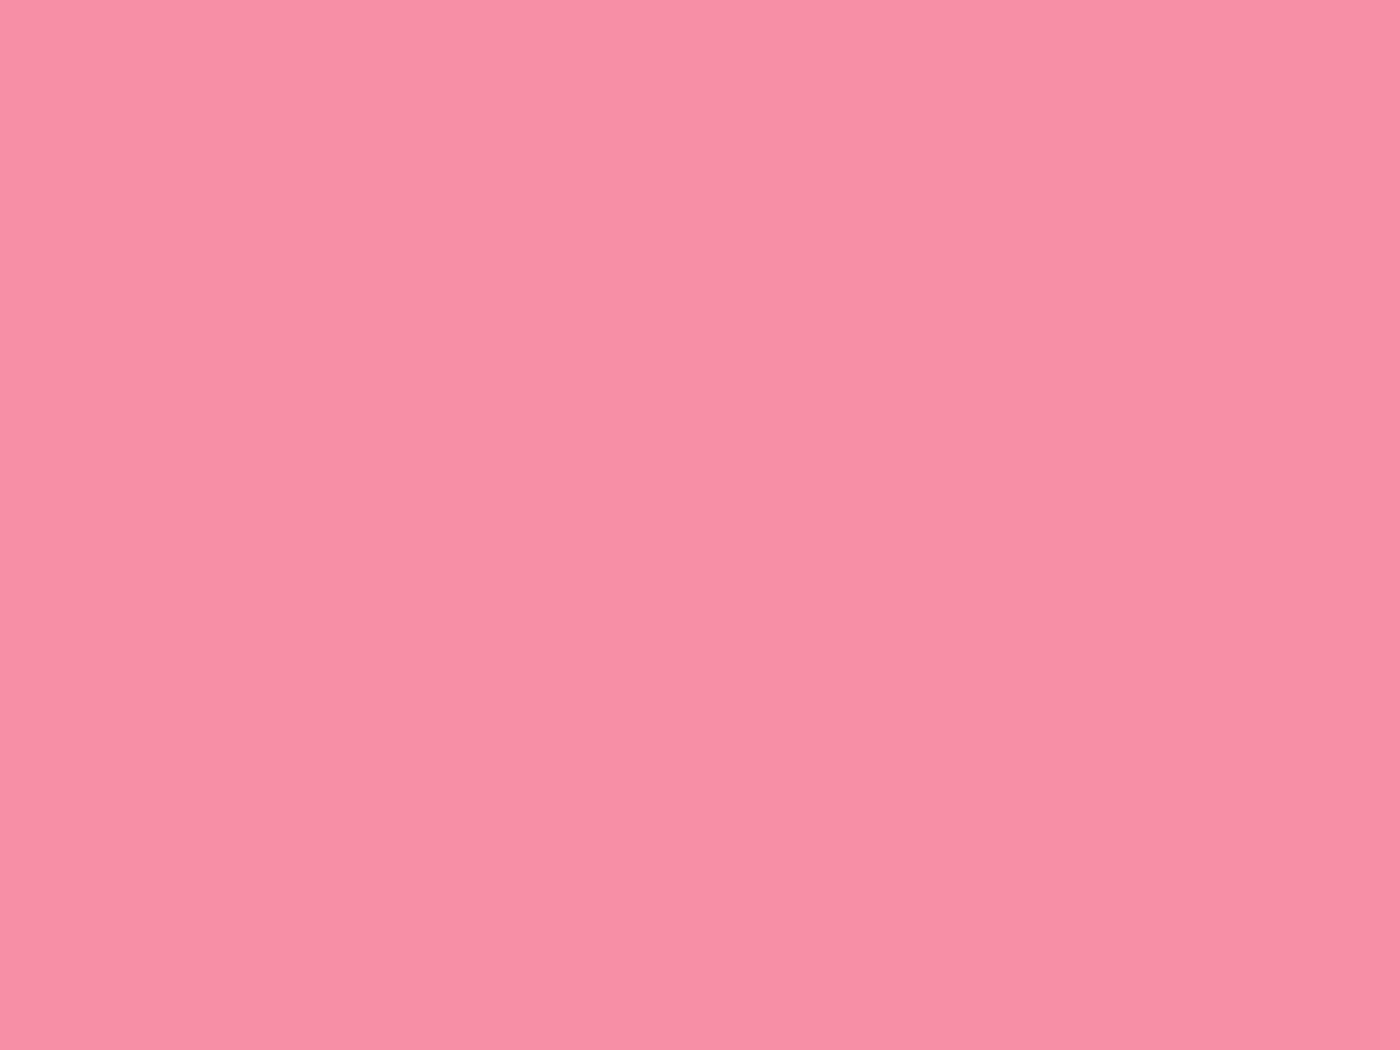 1400x1050 Pink Sherbet Solid Color Background